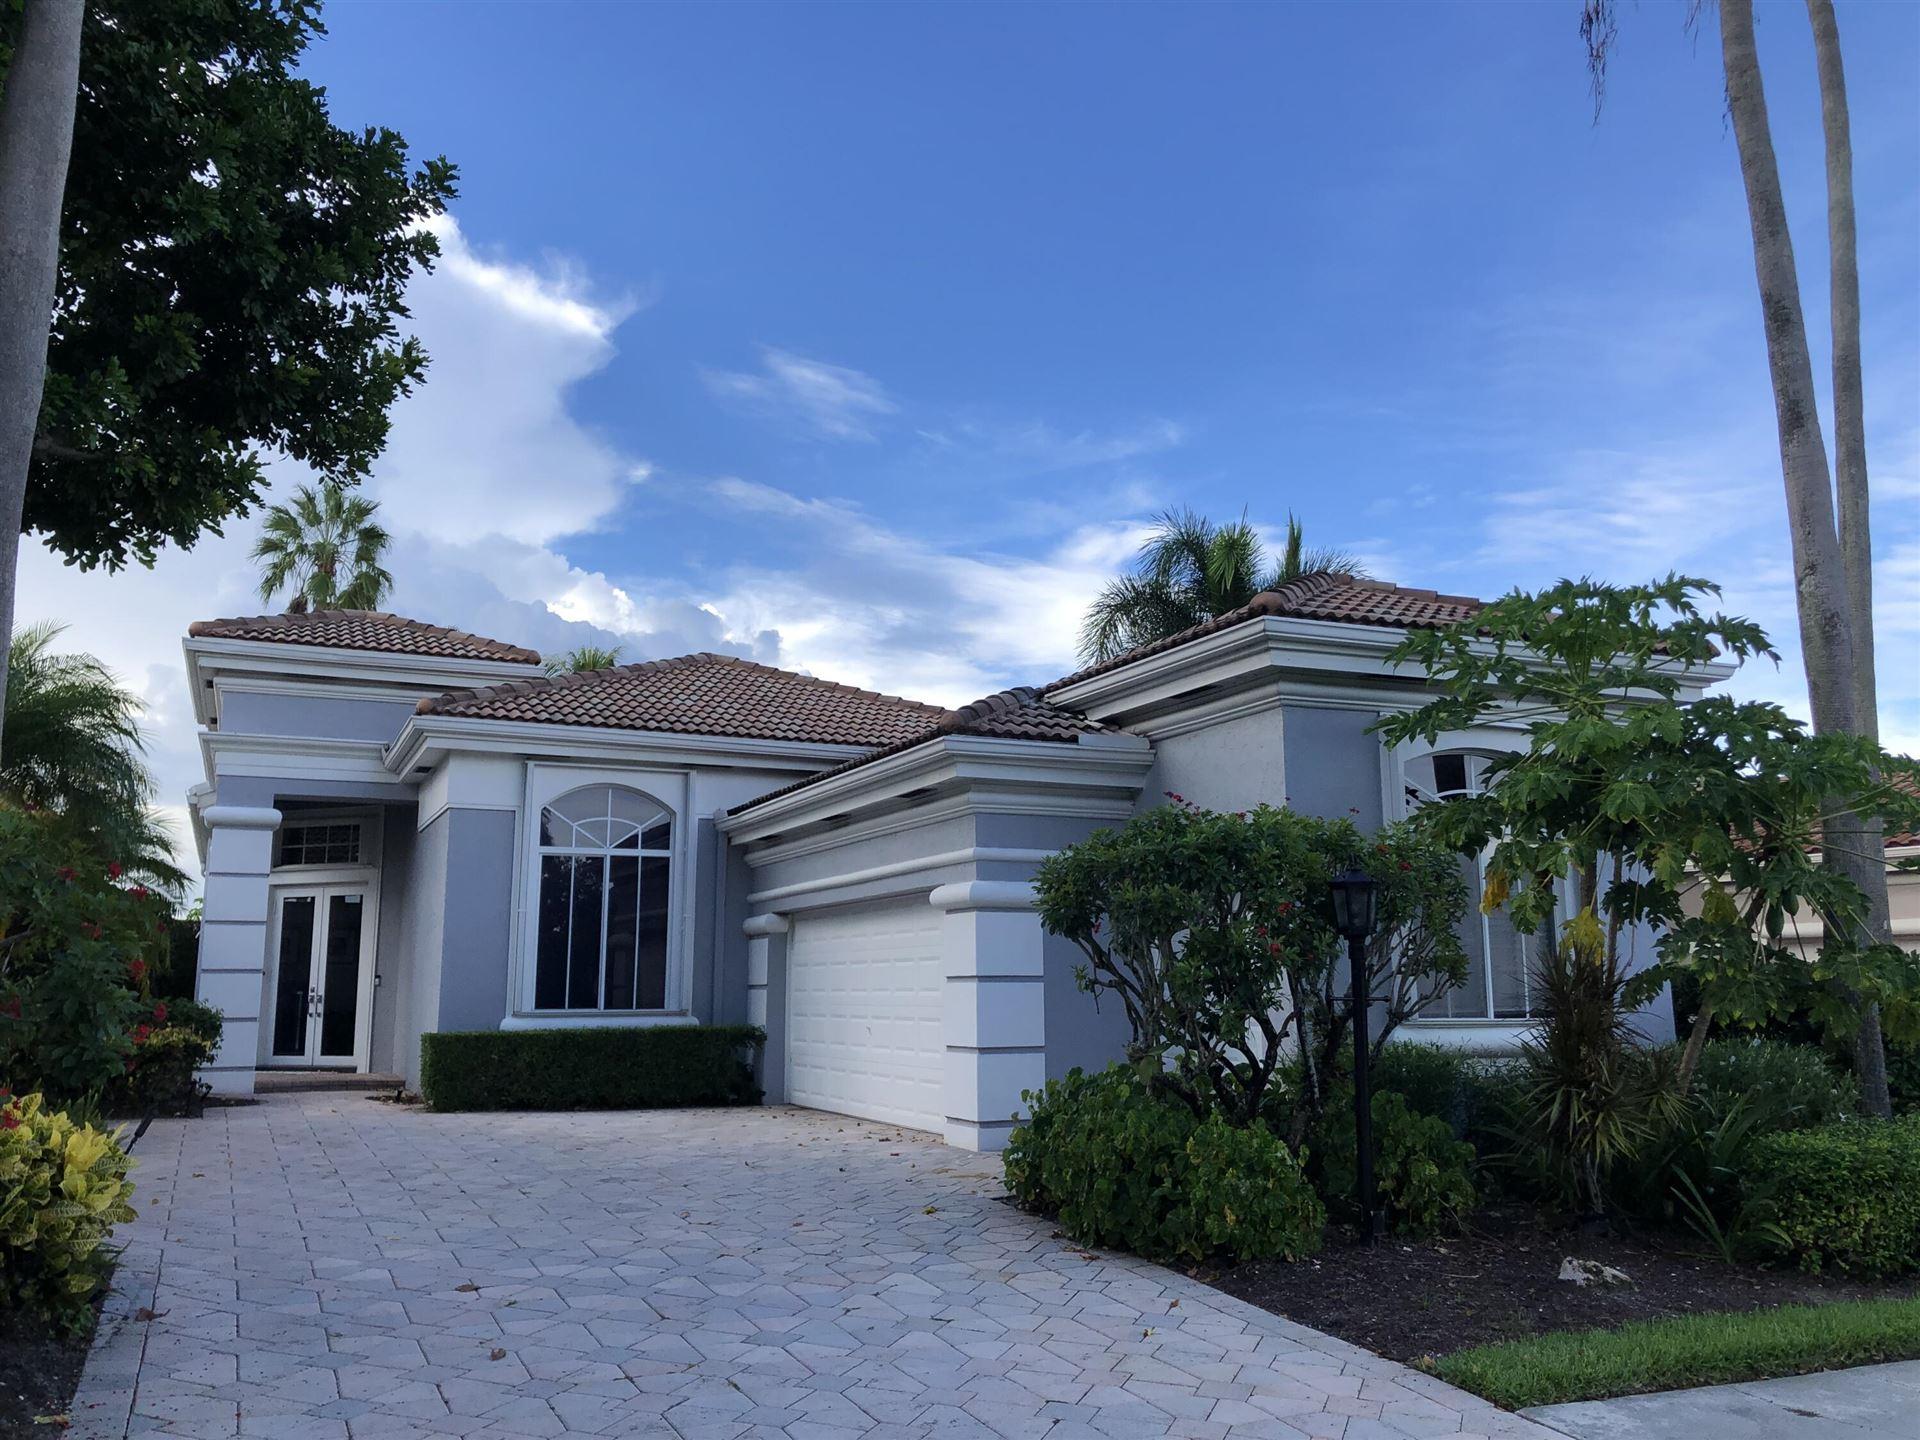 Photo of 273 Isle Way, Palm Beach Gardens, FL 33418 (MLS # RX-10747130)